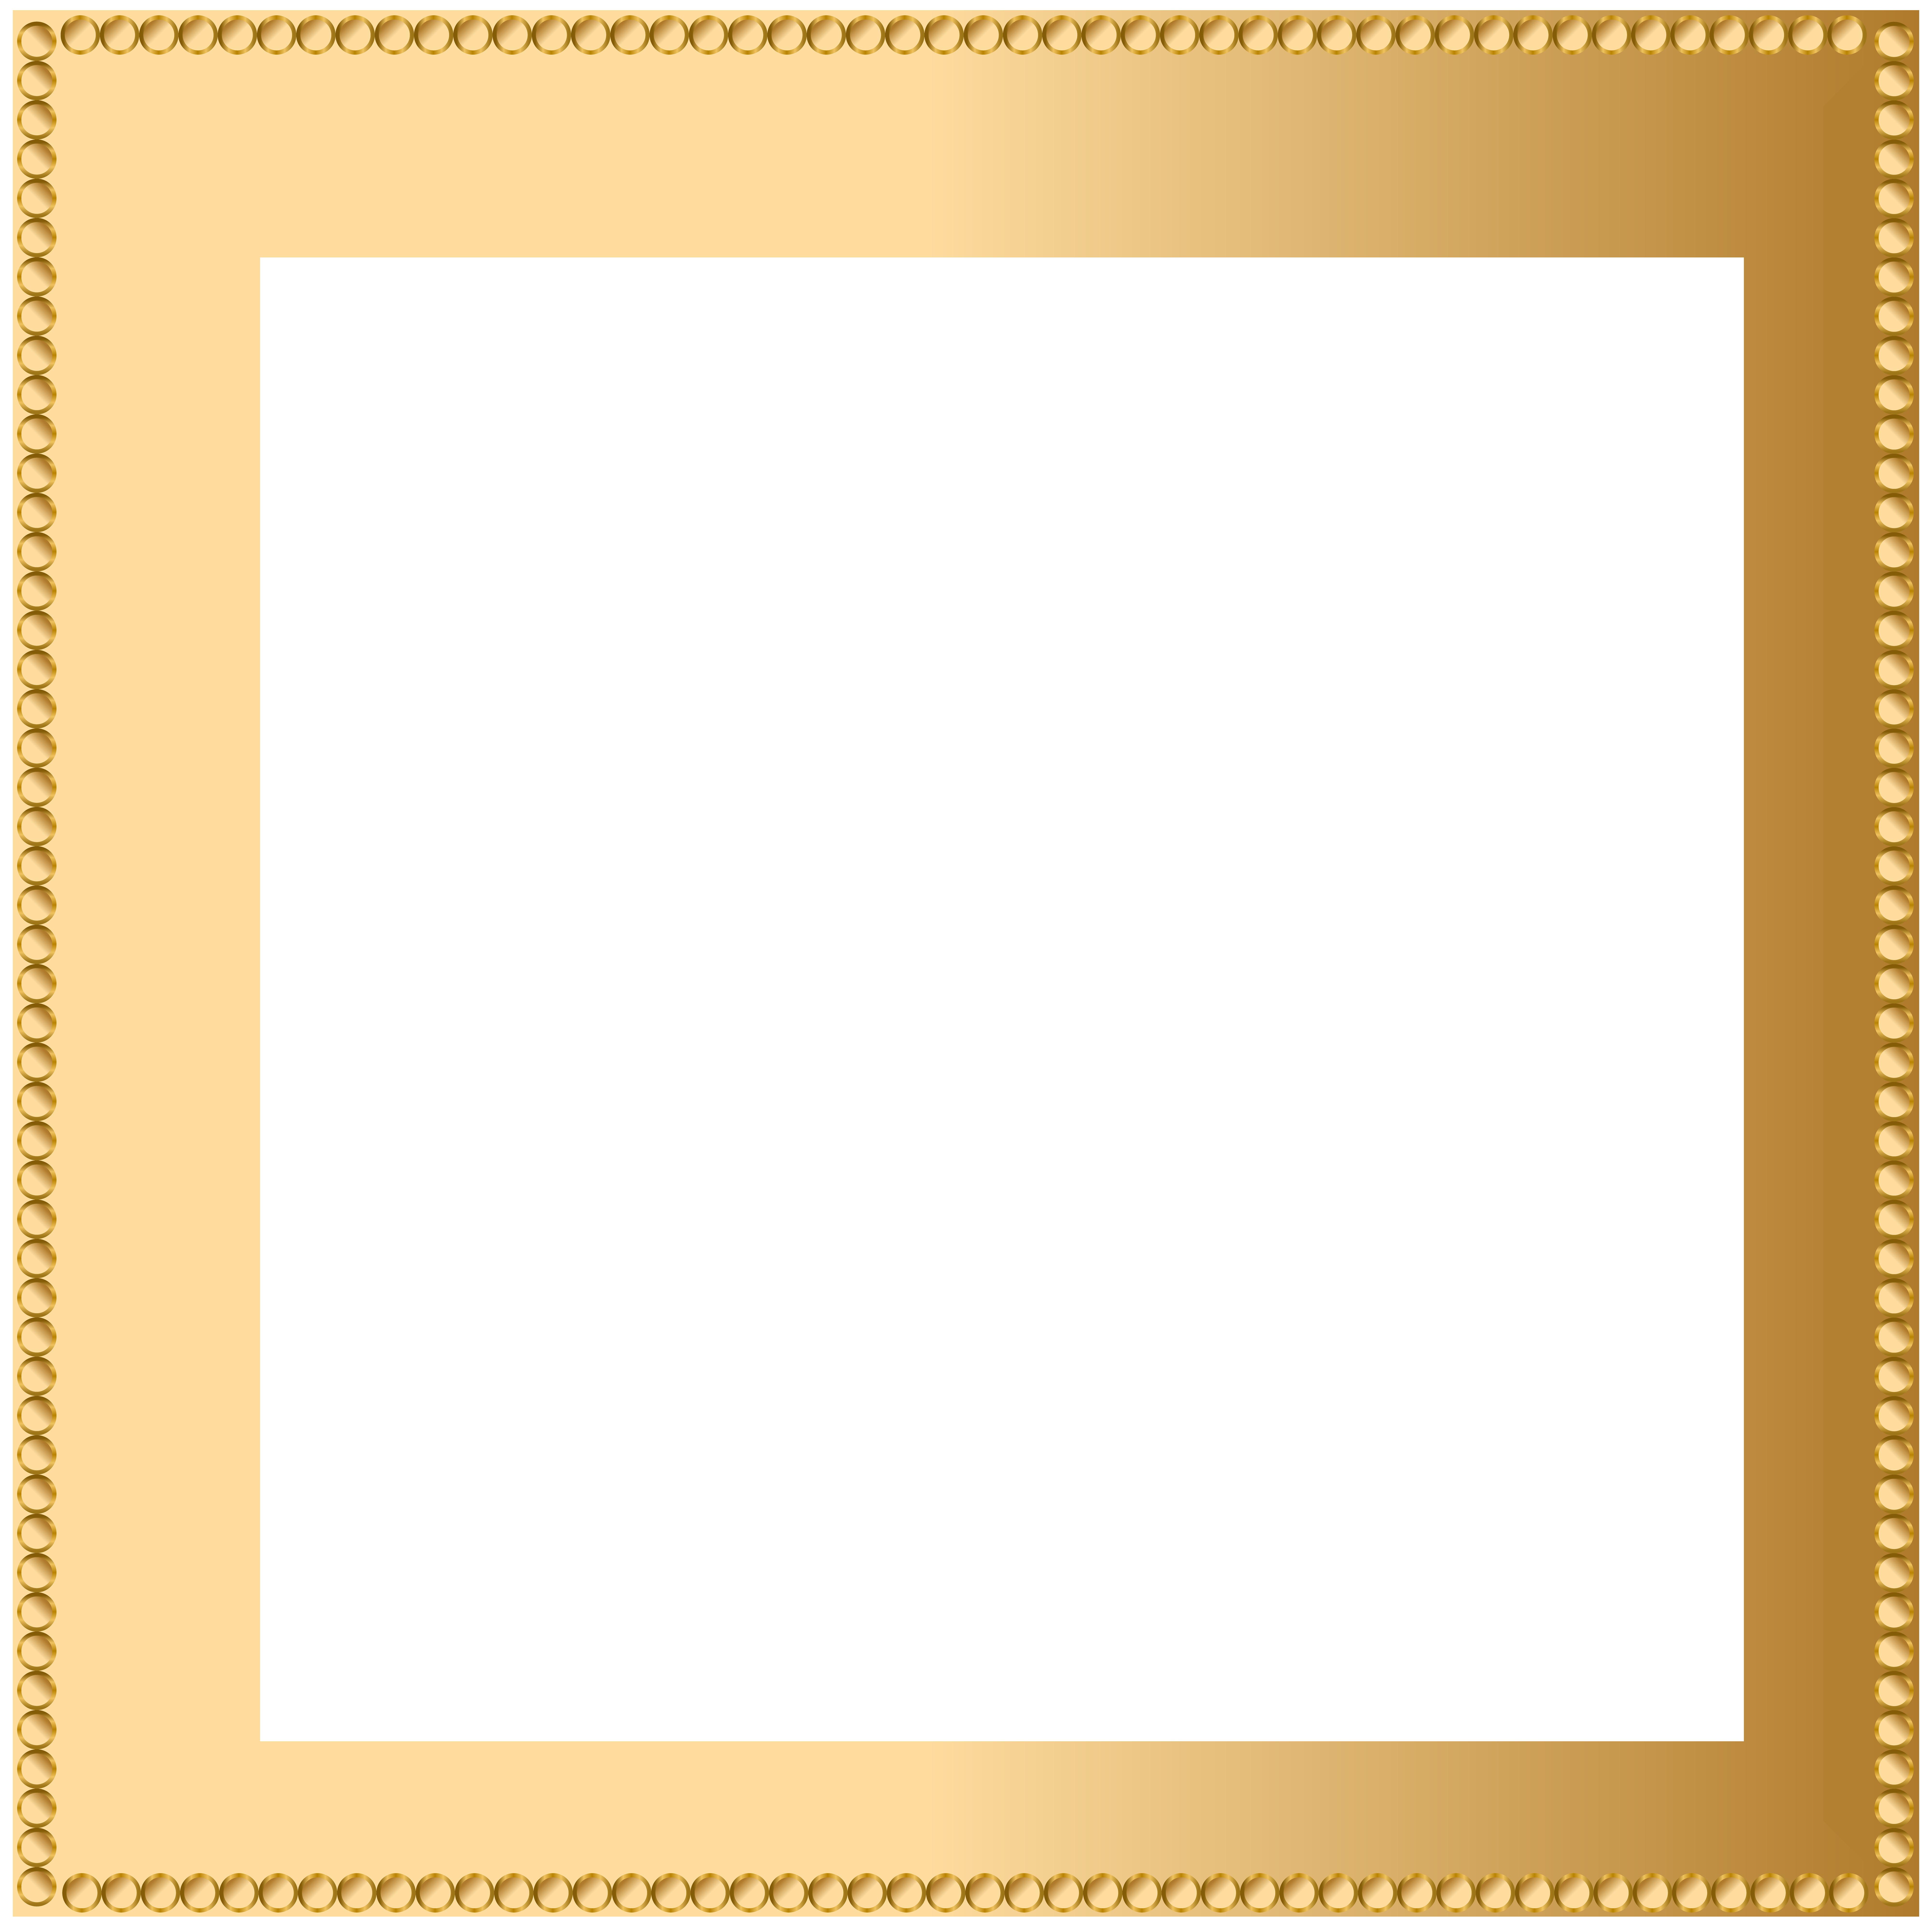 Frame transparent png image. Clipart gallery border